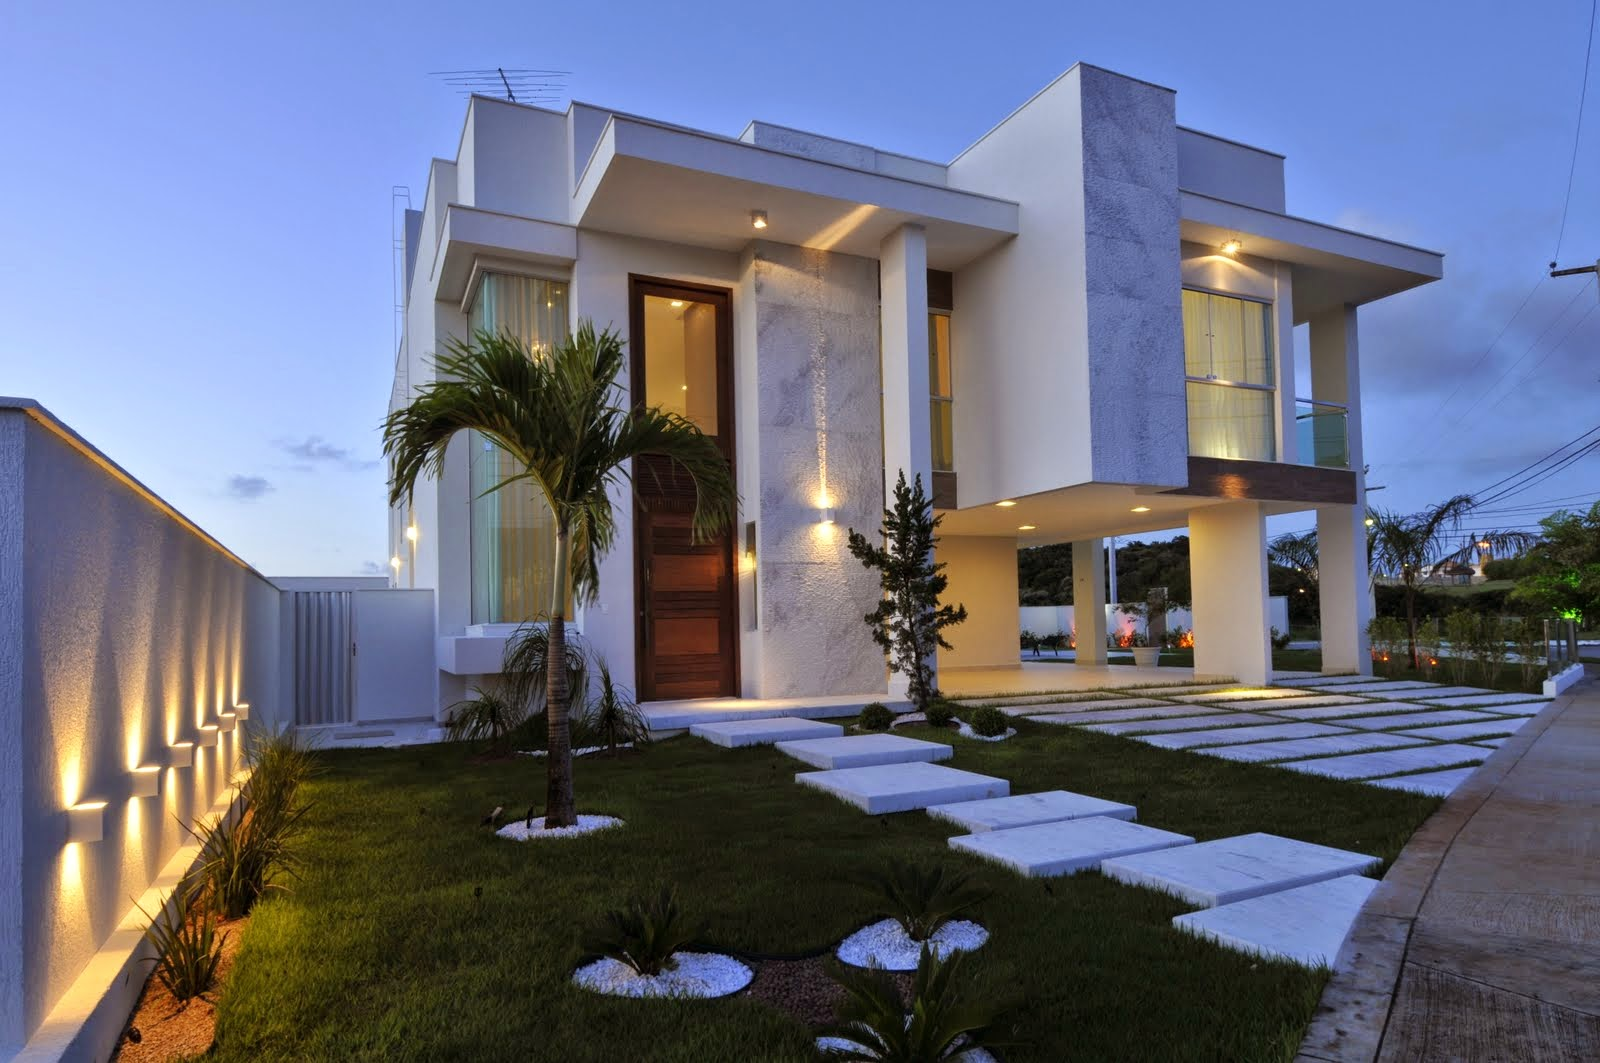 Fotos plantas de casas para construir 25